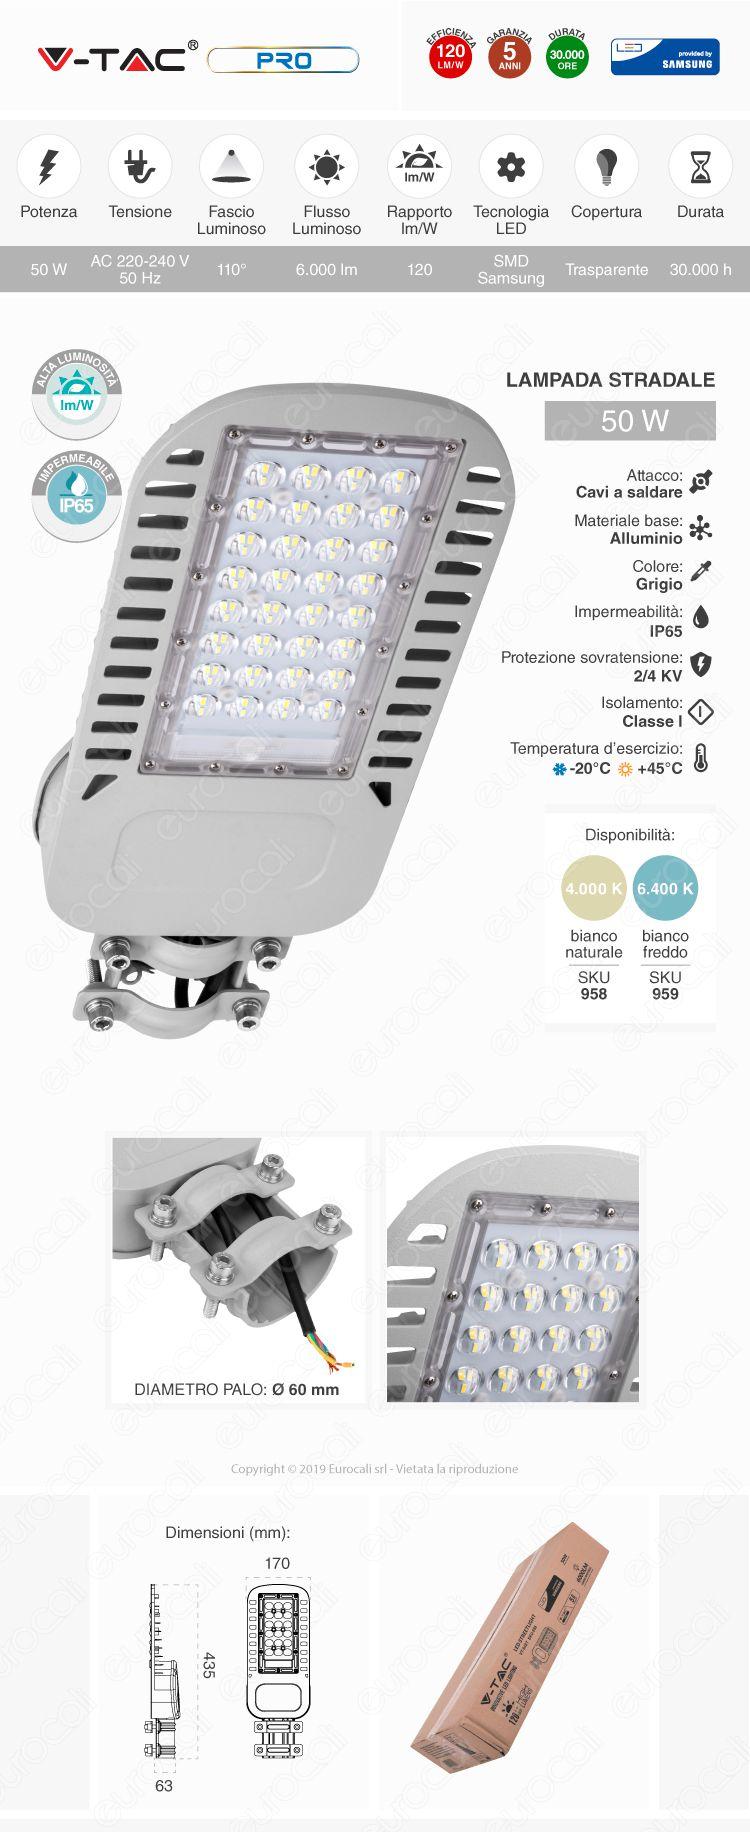 V-Tac PRO VT-54ST Lampada Stradale LED 50W Lampione SMD Chip Samsung